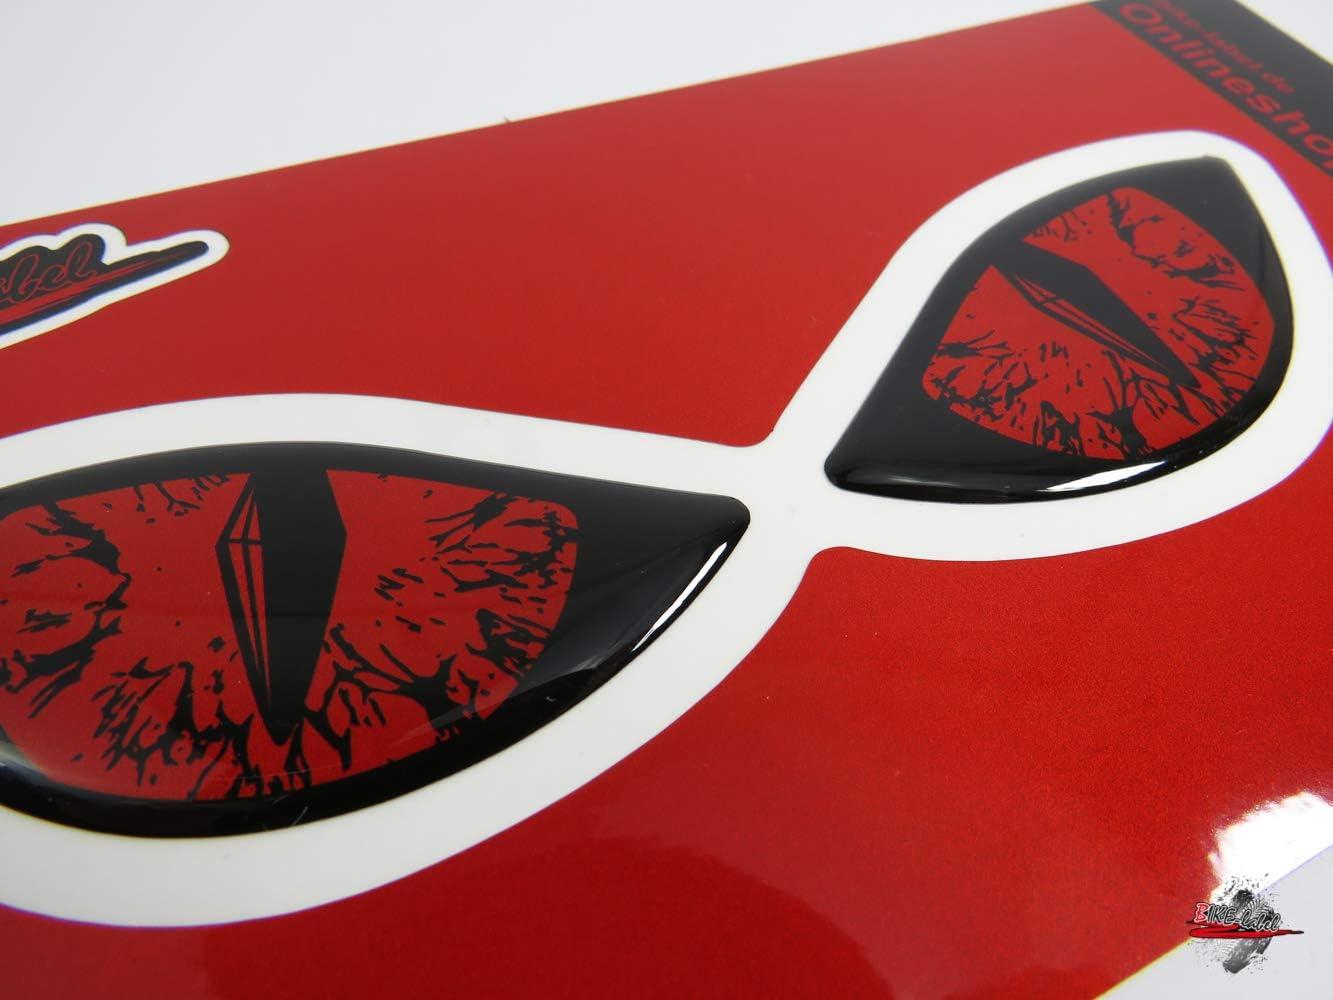 Bike Label 910065va Reflektor Aufkleber 3d Böse Augen Auto Motorrad Helm Rot Auto